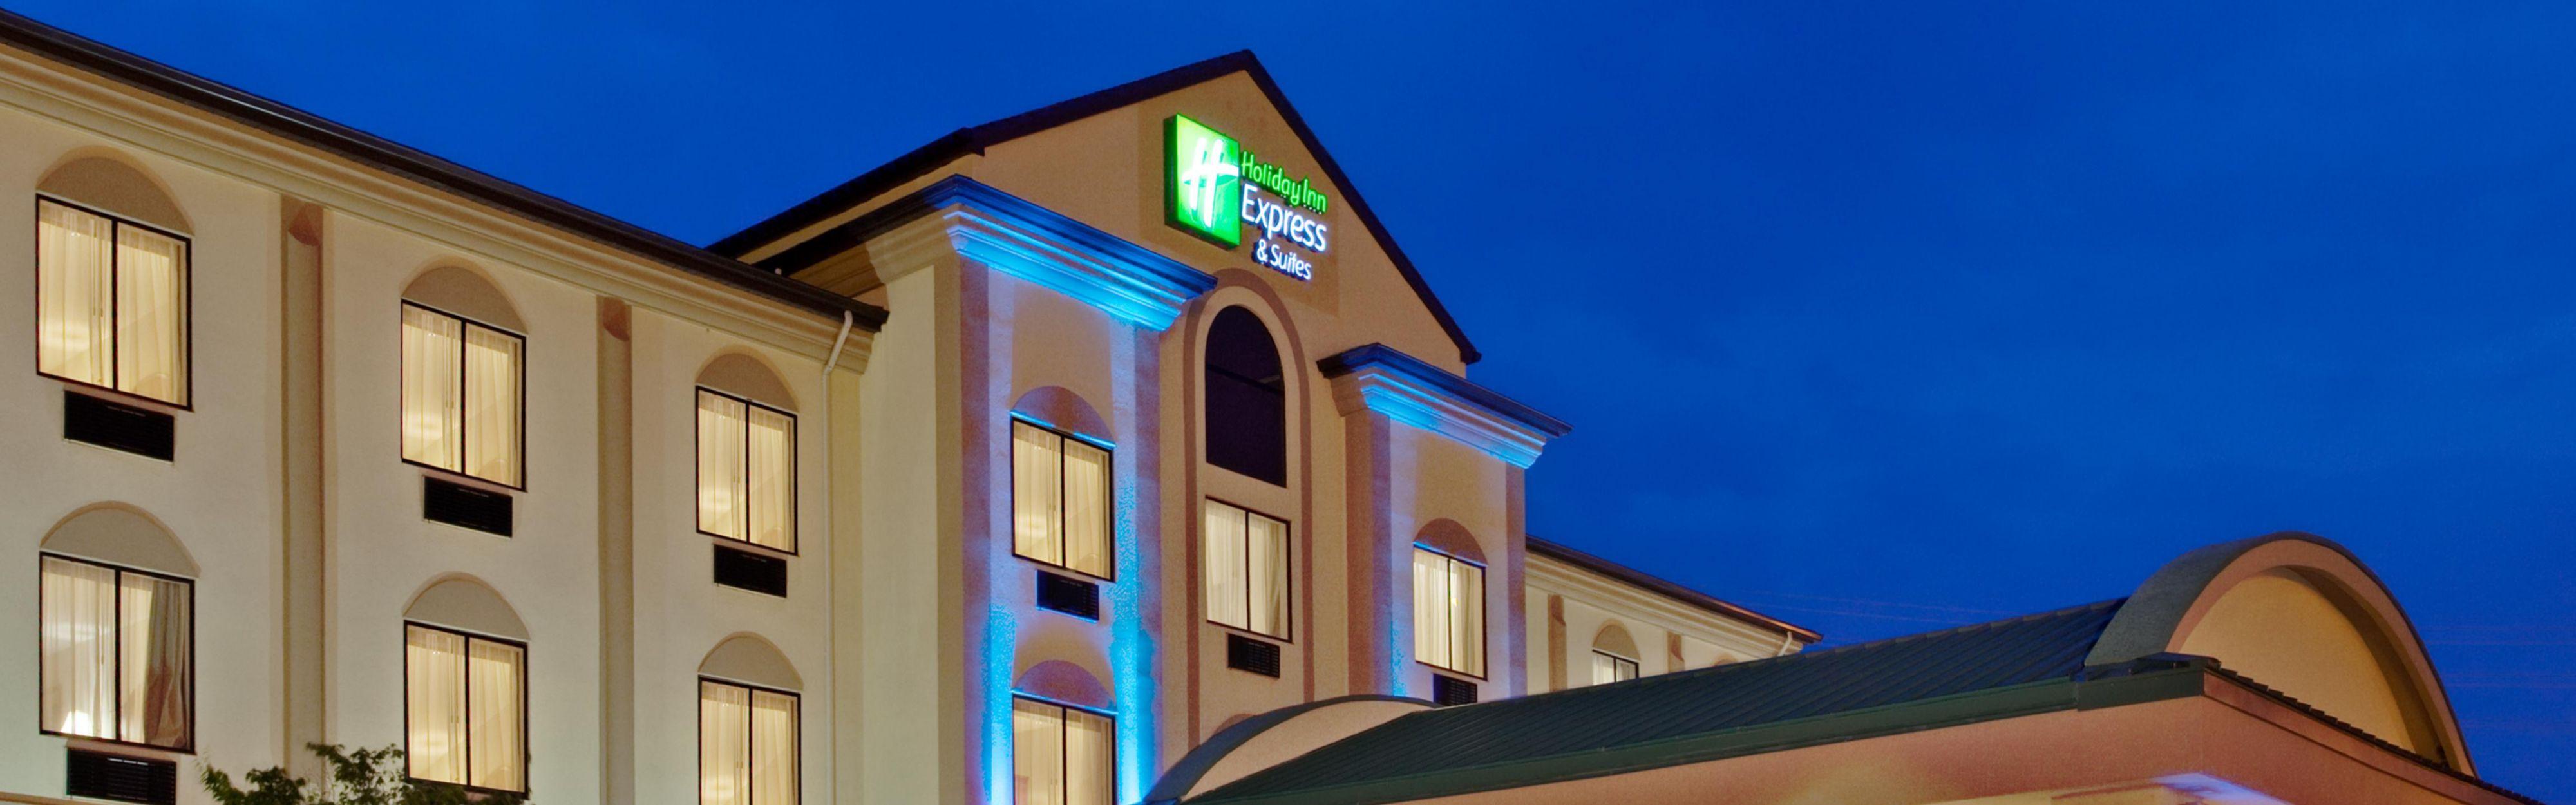 Holiday Inn Express & Suites Newton Sparta image 0